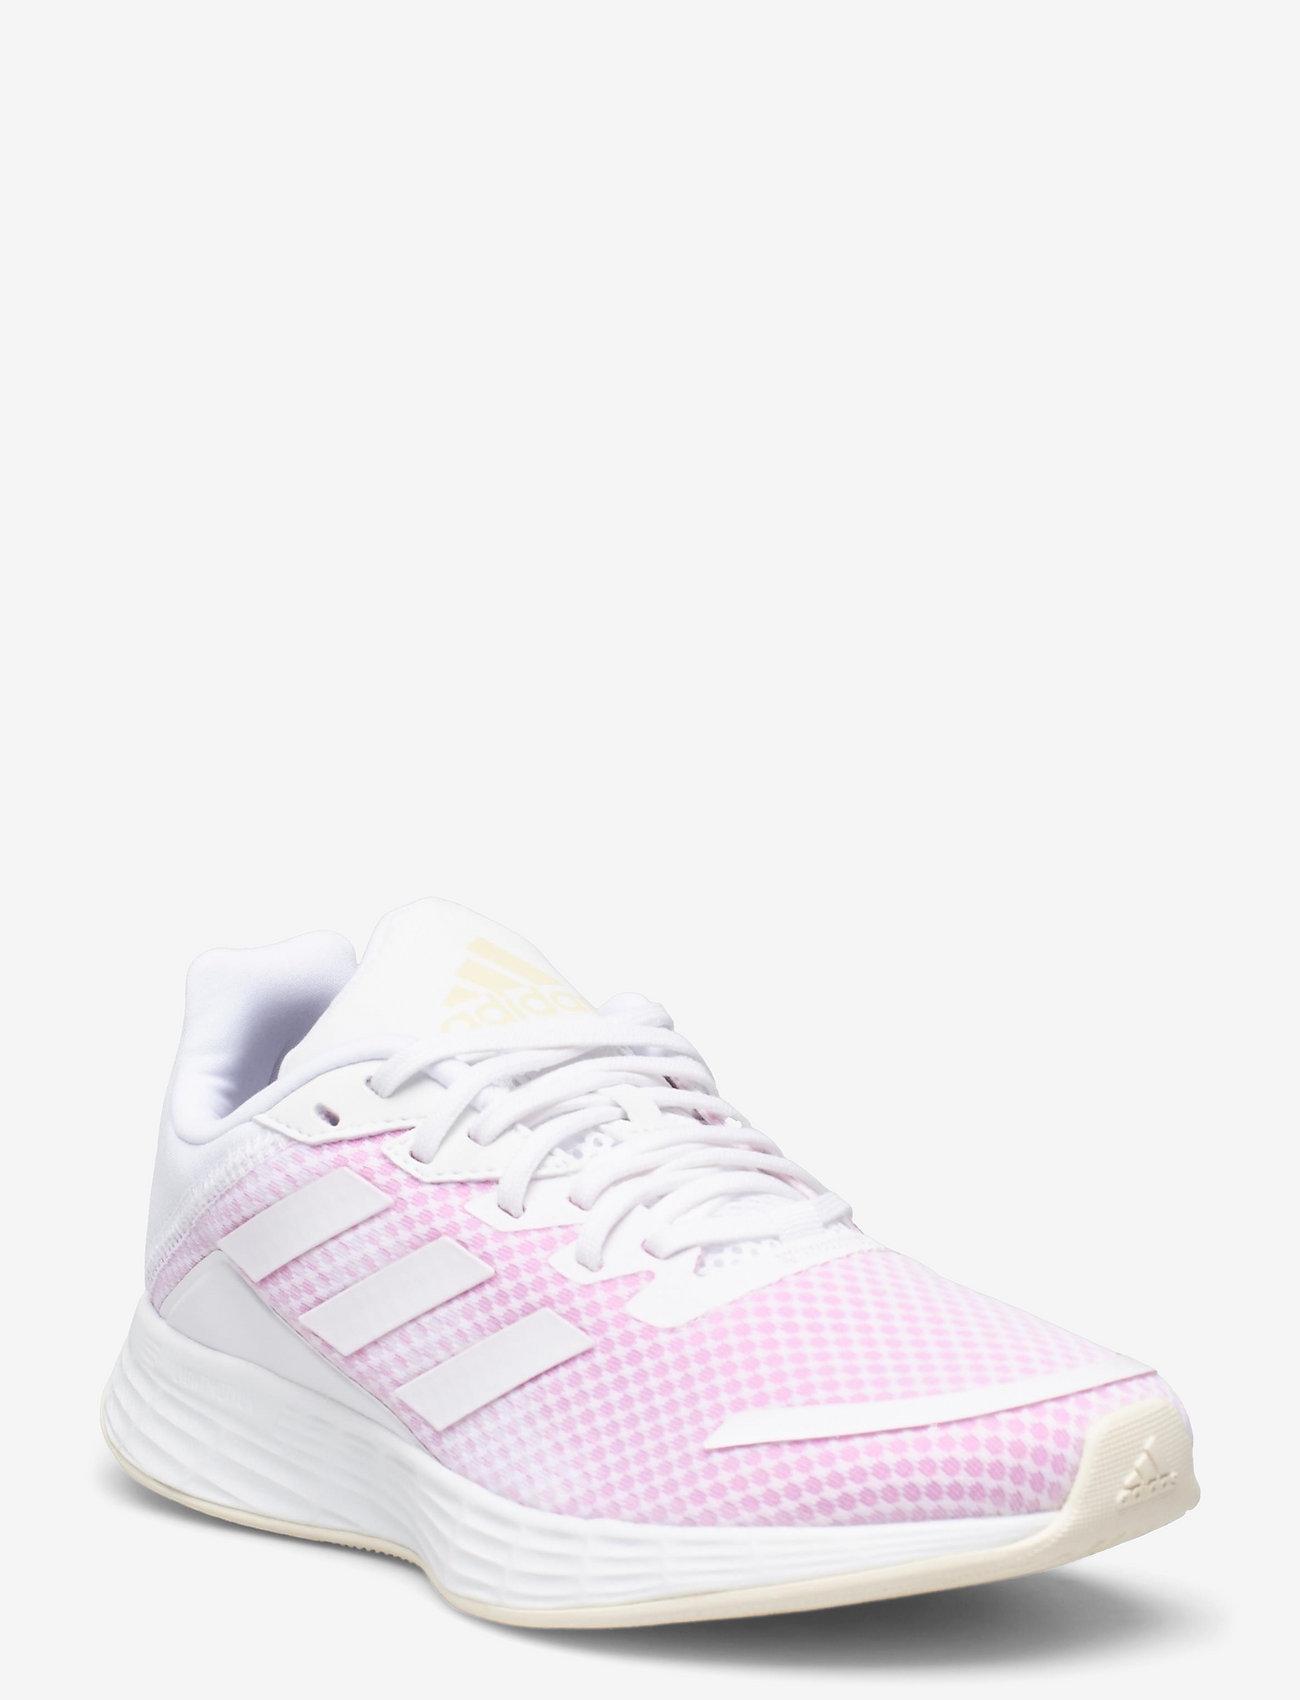 adidas Performance - Duramo SL  W - running shoes - ftwwht/ftwwht/scrpnk - 0